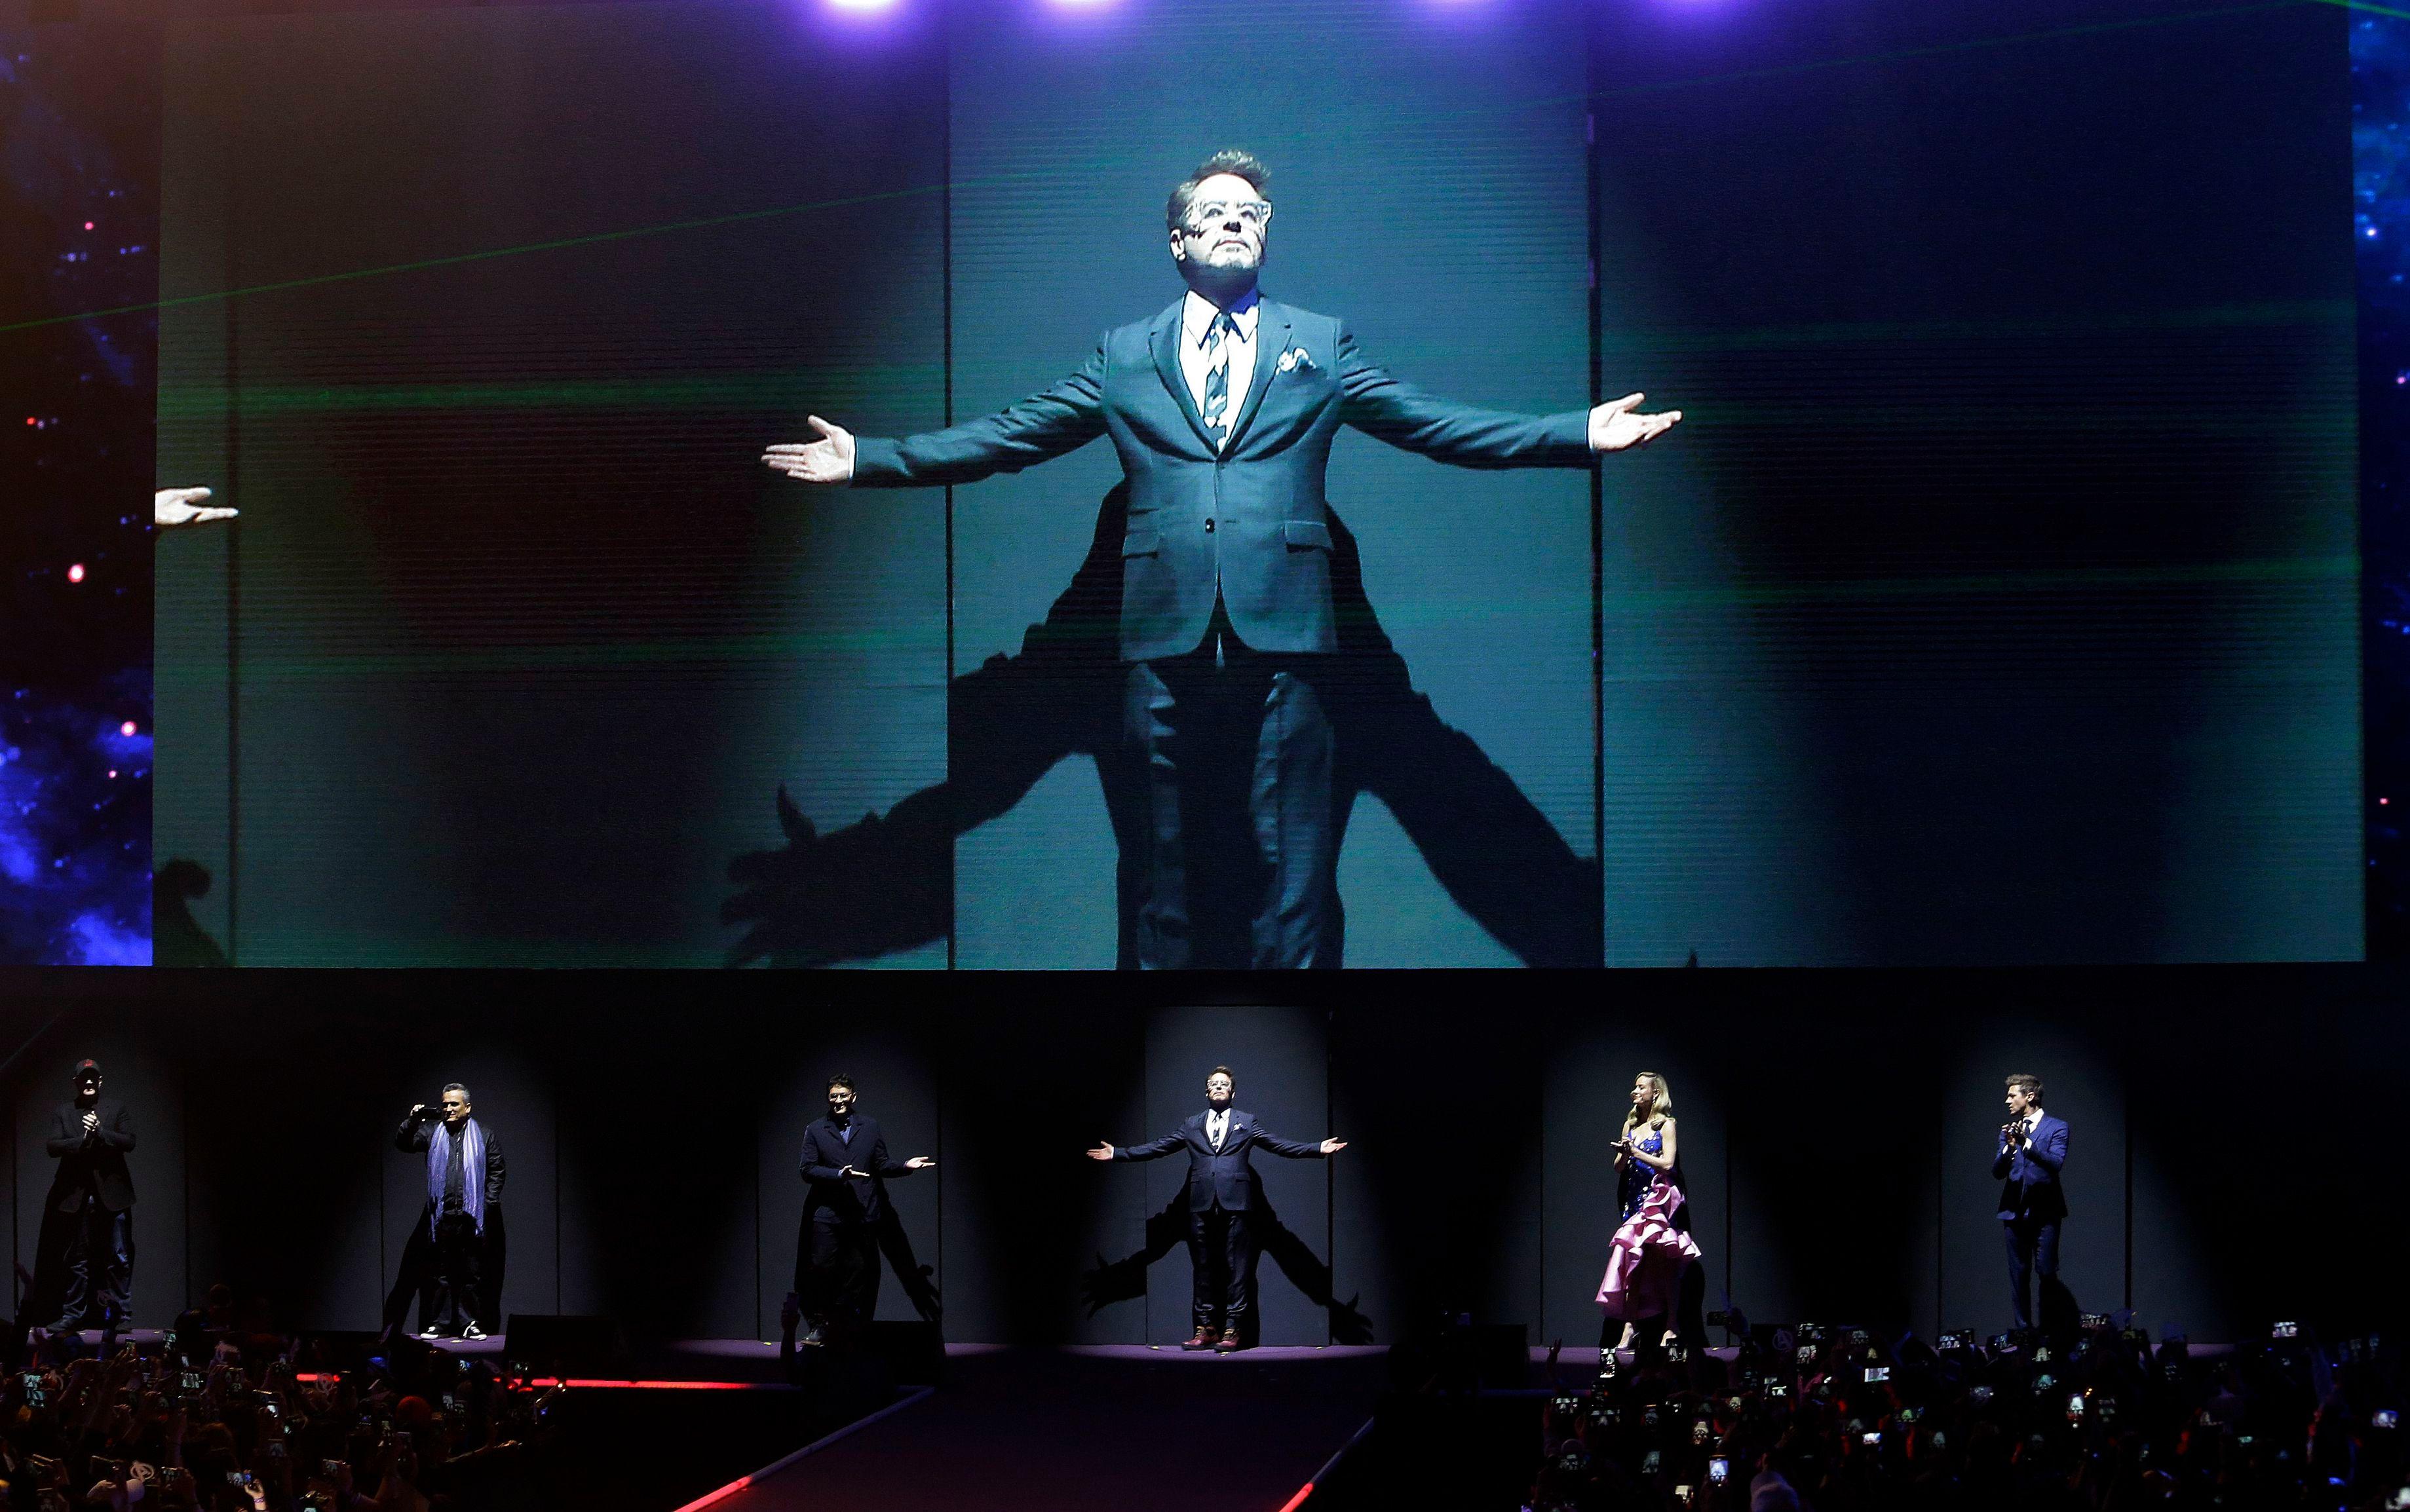 'Avengers: Endgame' Press Tour: Anaheim, London, and Seoul